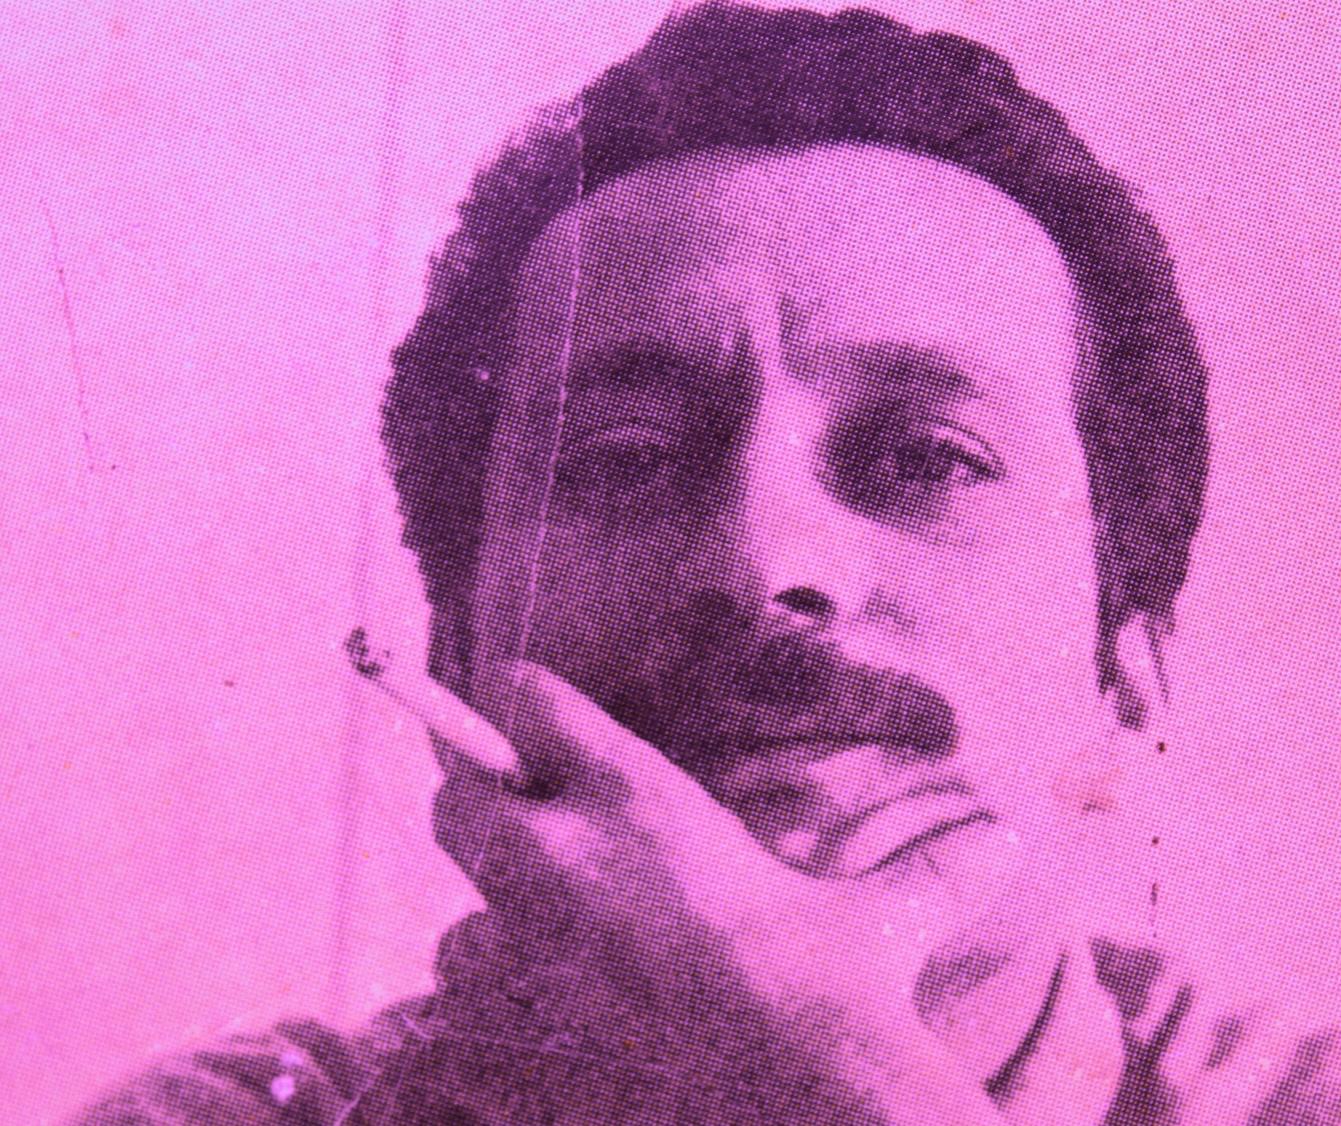 يوميات غسان كنفاني... (1959 ـ 1965) (1/2)